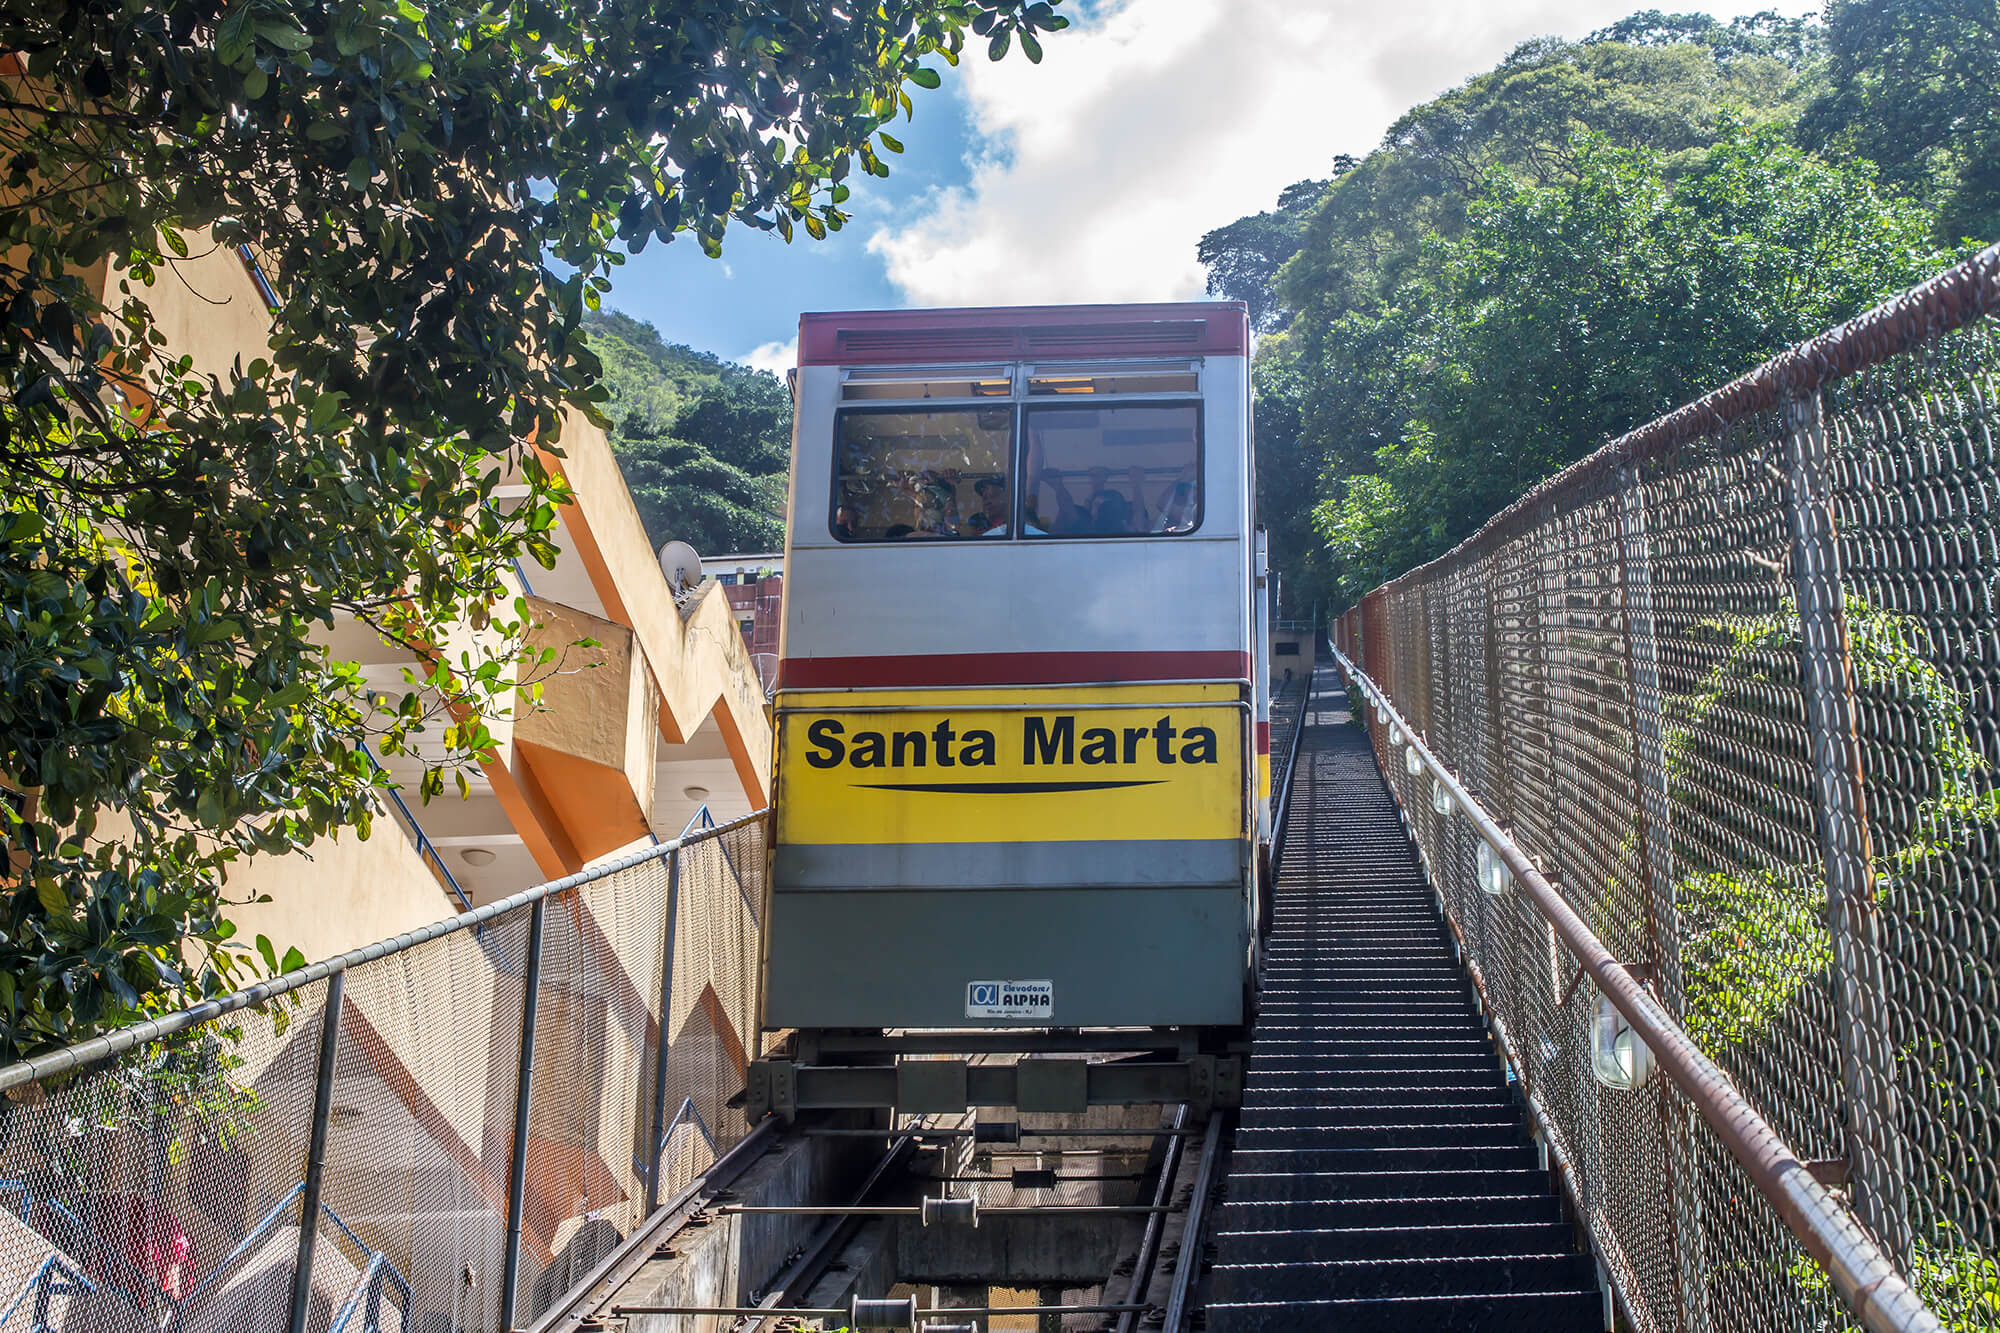 Santa-Marta-11